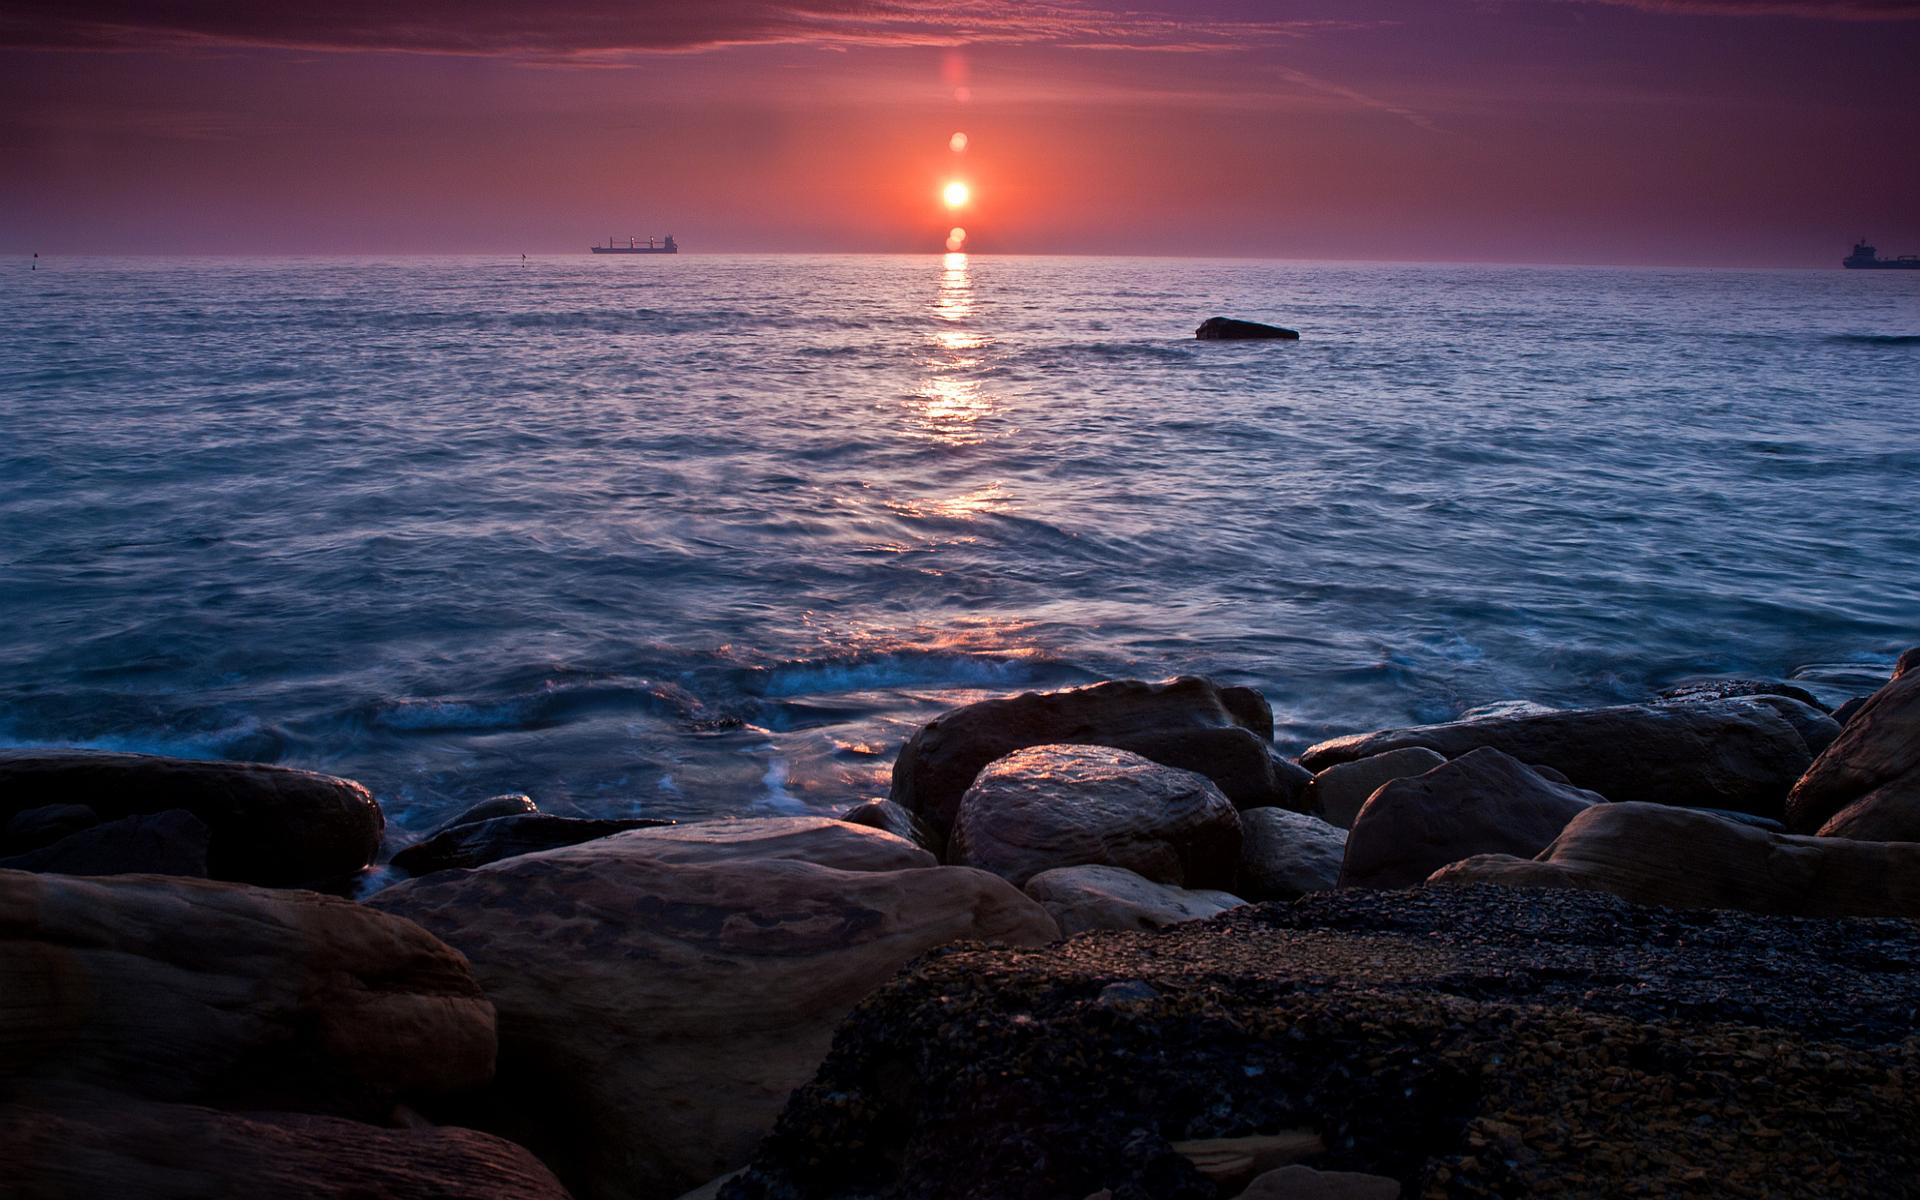 sunset beach nature sea - photo #26